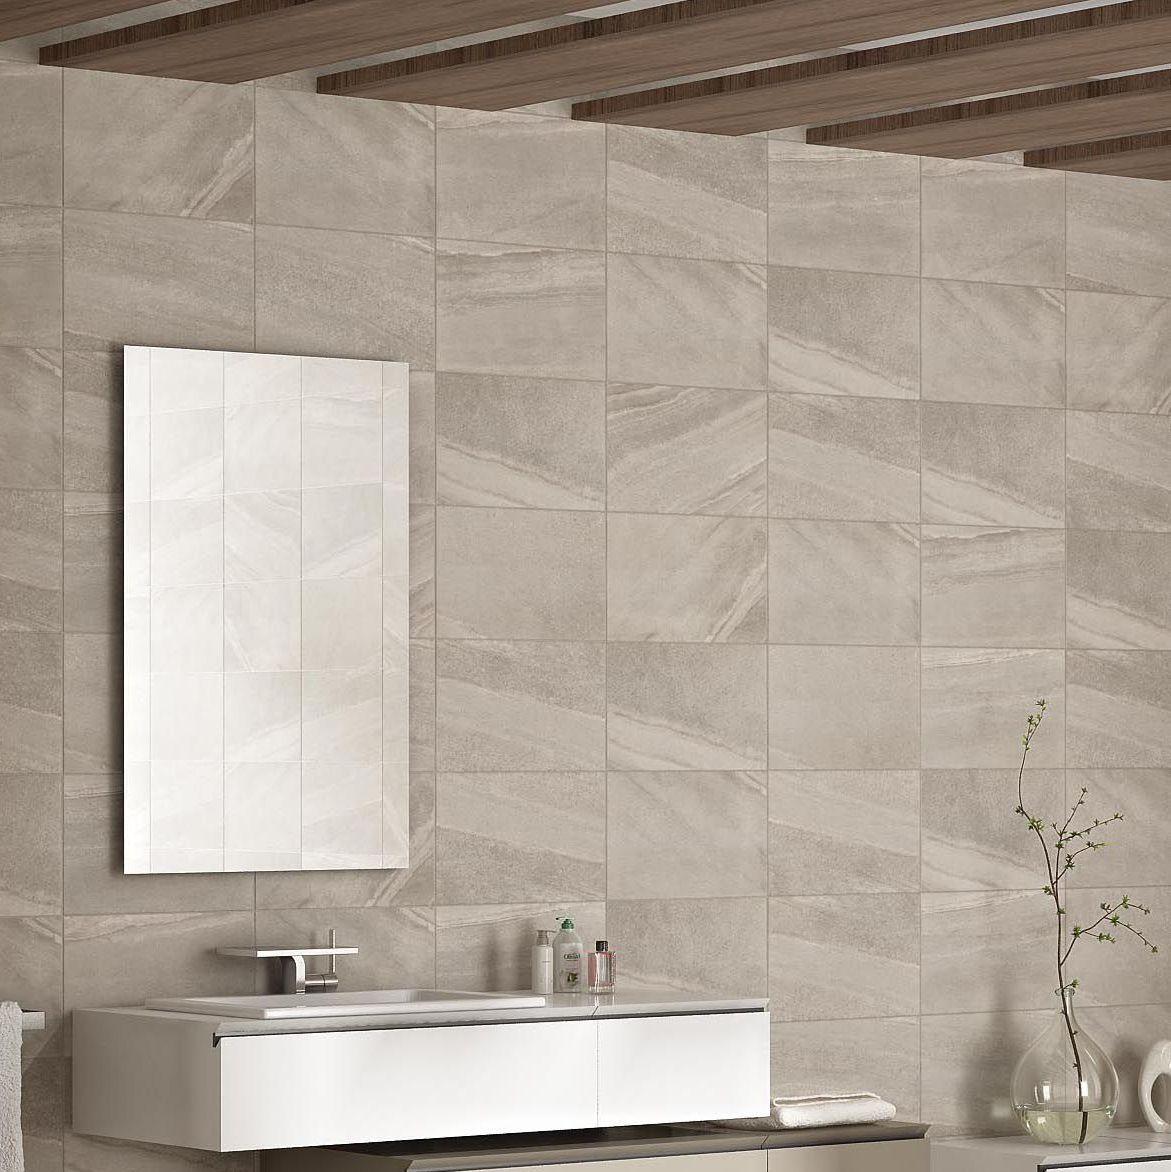 Levanto White Ceramic Wall Tile Pack Of 10 L 250mm W: Fiji Grey Stone Effect Ceramic Wall Tile, Pack Of 10, (L